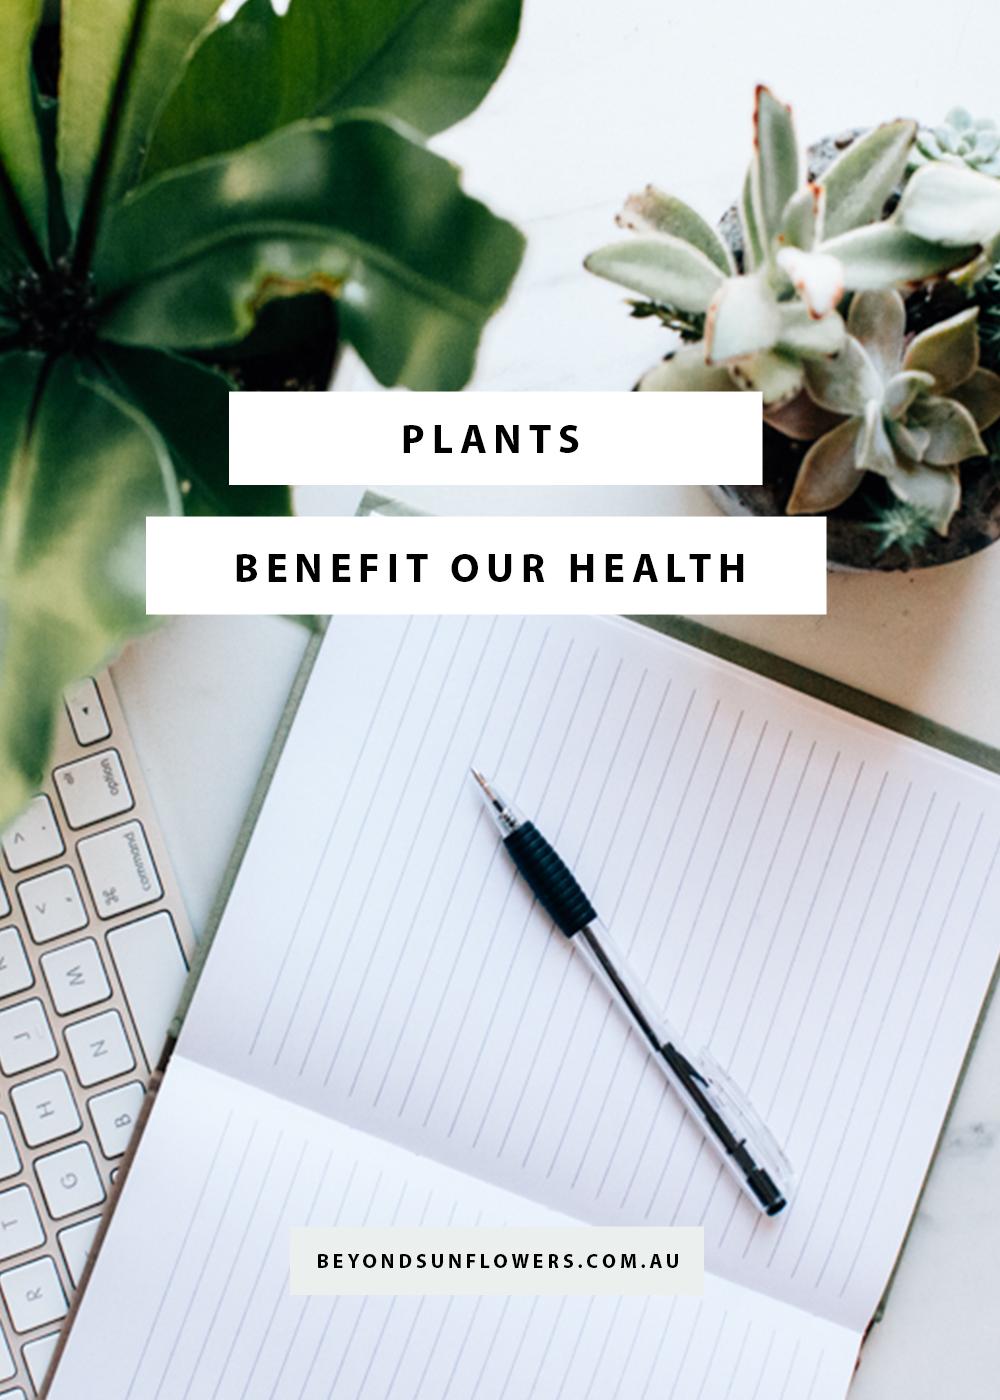 Plants benefit our health